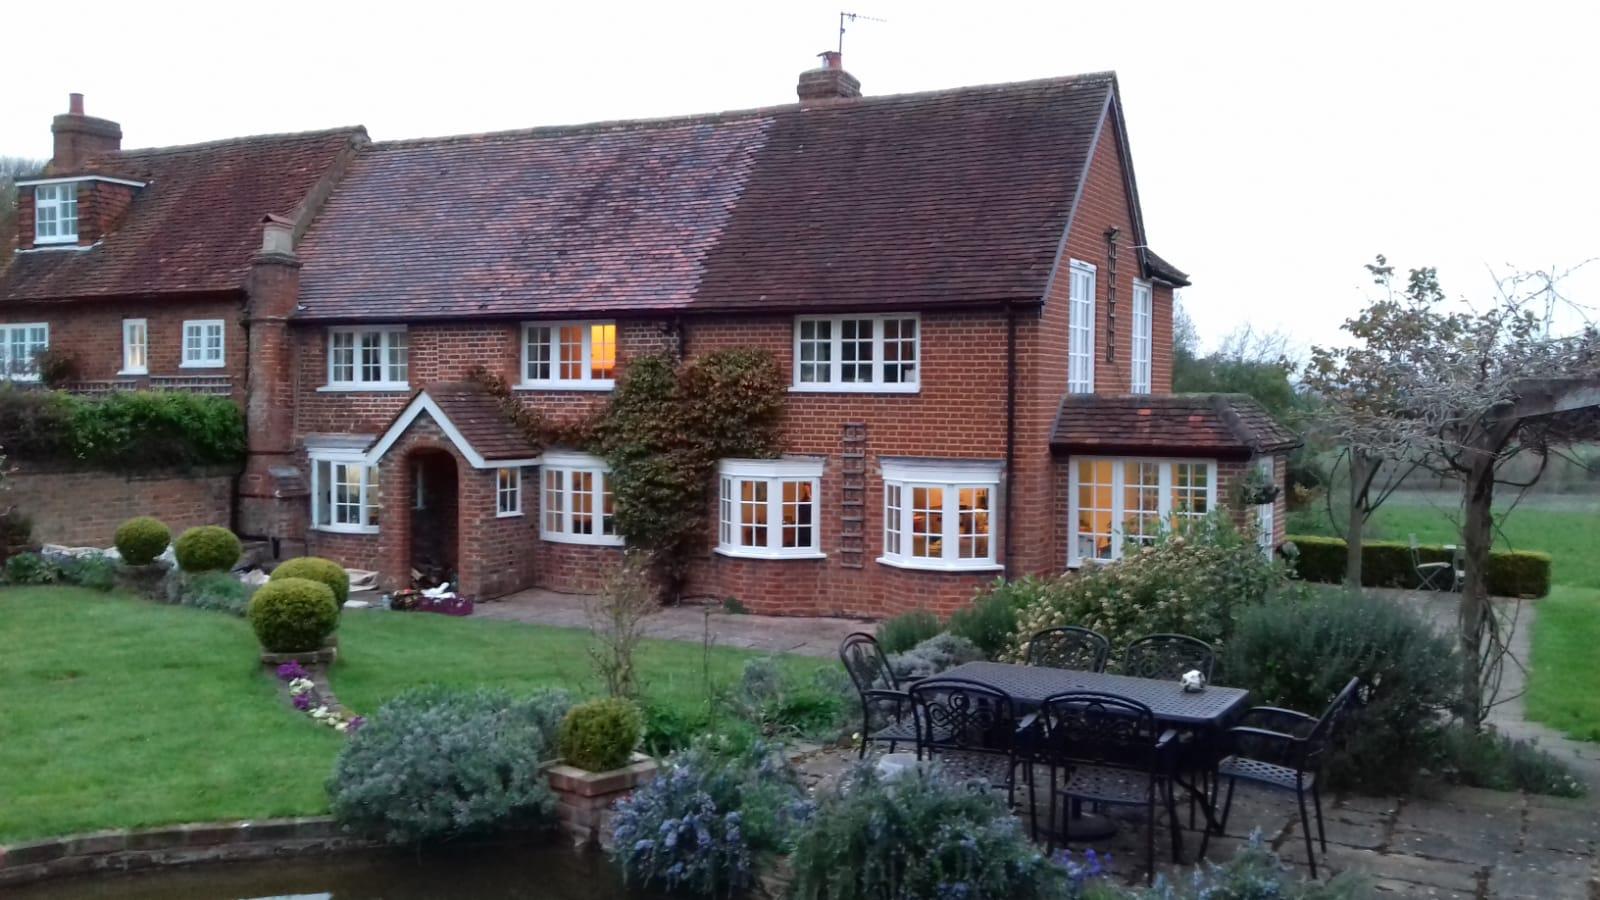 Window Replacements & Overhauls